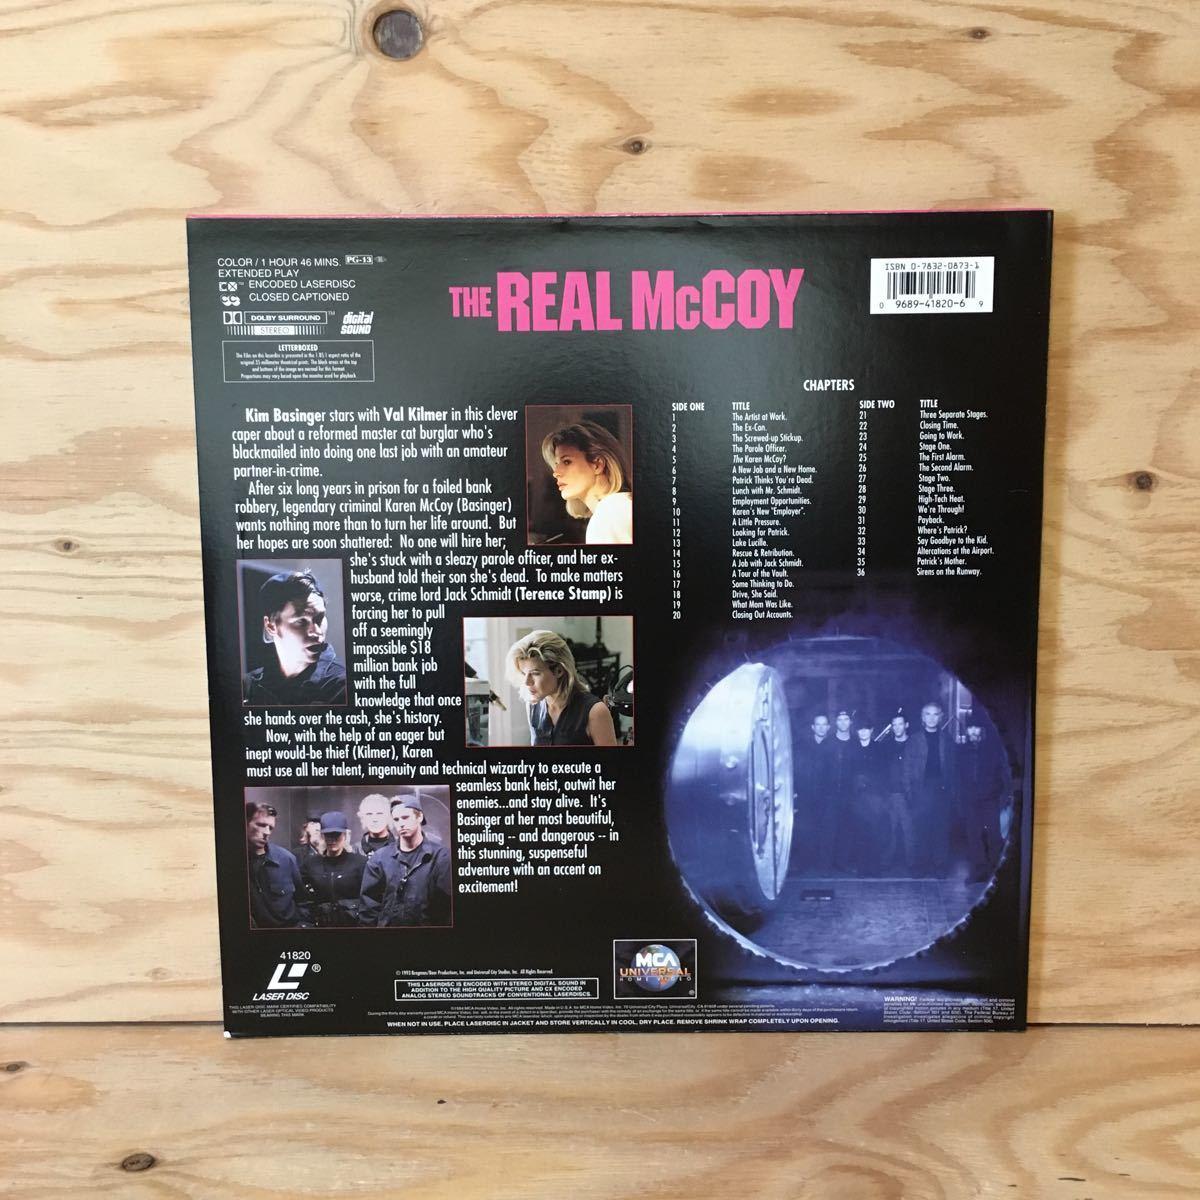 ◎3FJJD-200218 レア[THE REAL McCOY]LD レーザーディスク KIM BASINGER RUSSELL MULCAHY_画像2